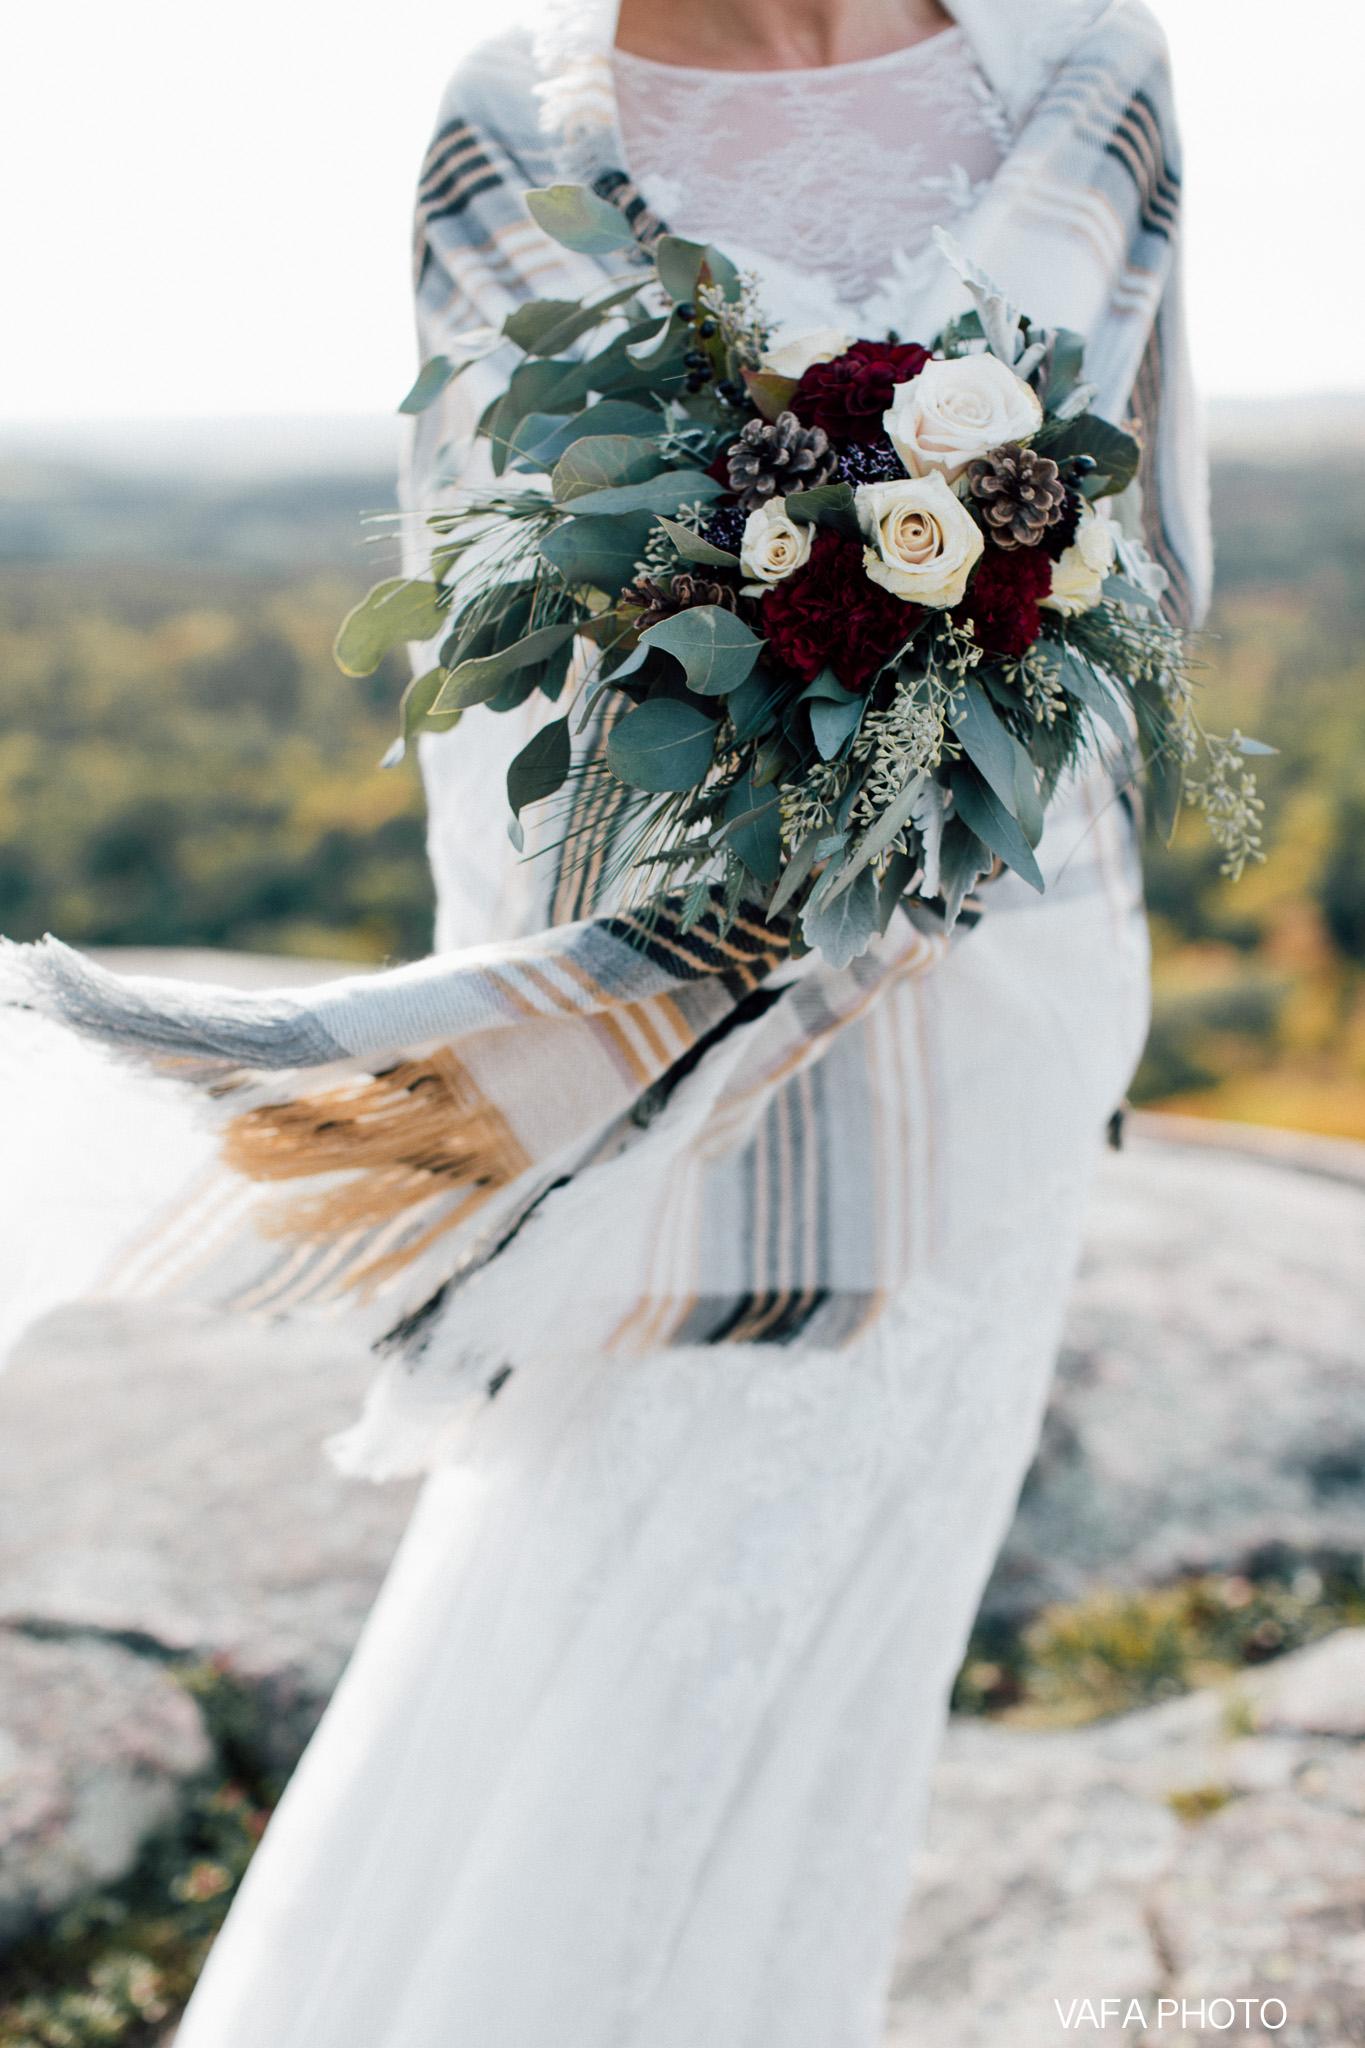 Hogback-Mountain-Wedding-Chelsea-Josh-Vafa-Photo-378.jpg